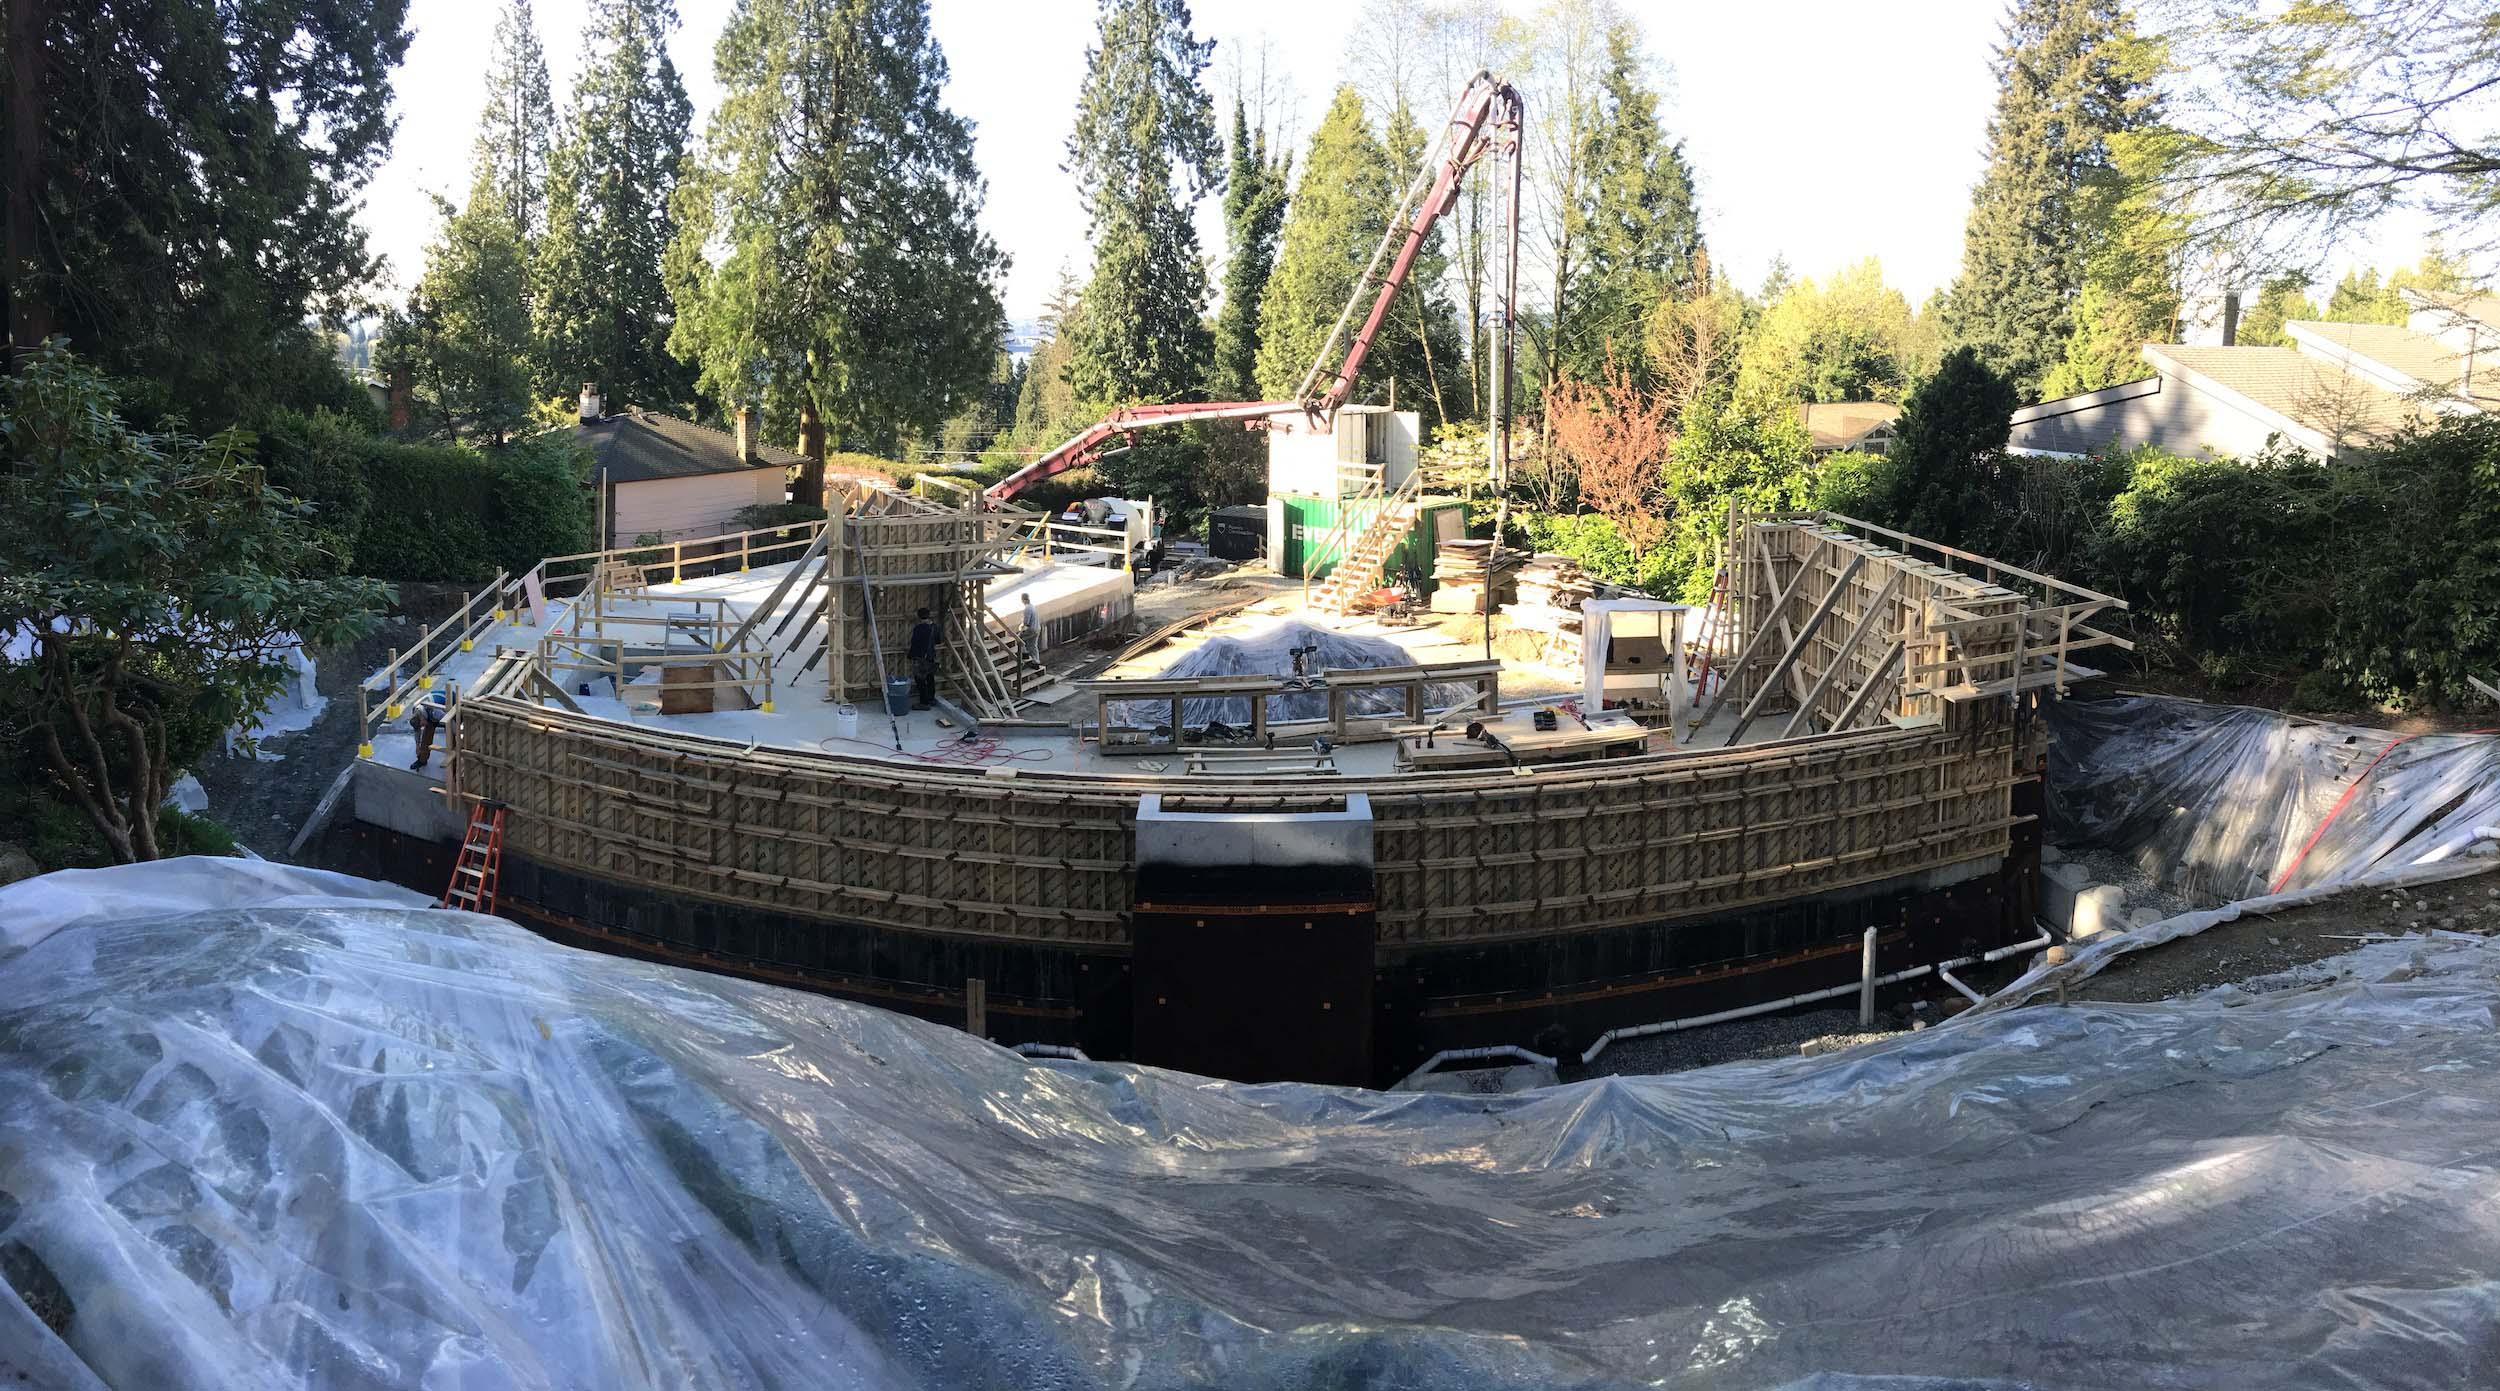 Postle_Construction_ConcreteForming17.jpg